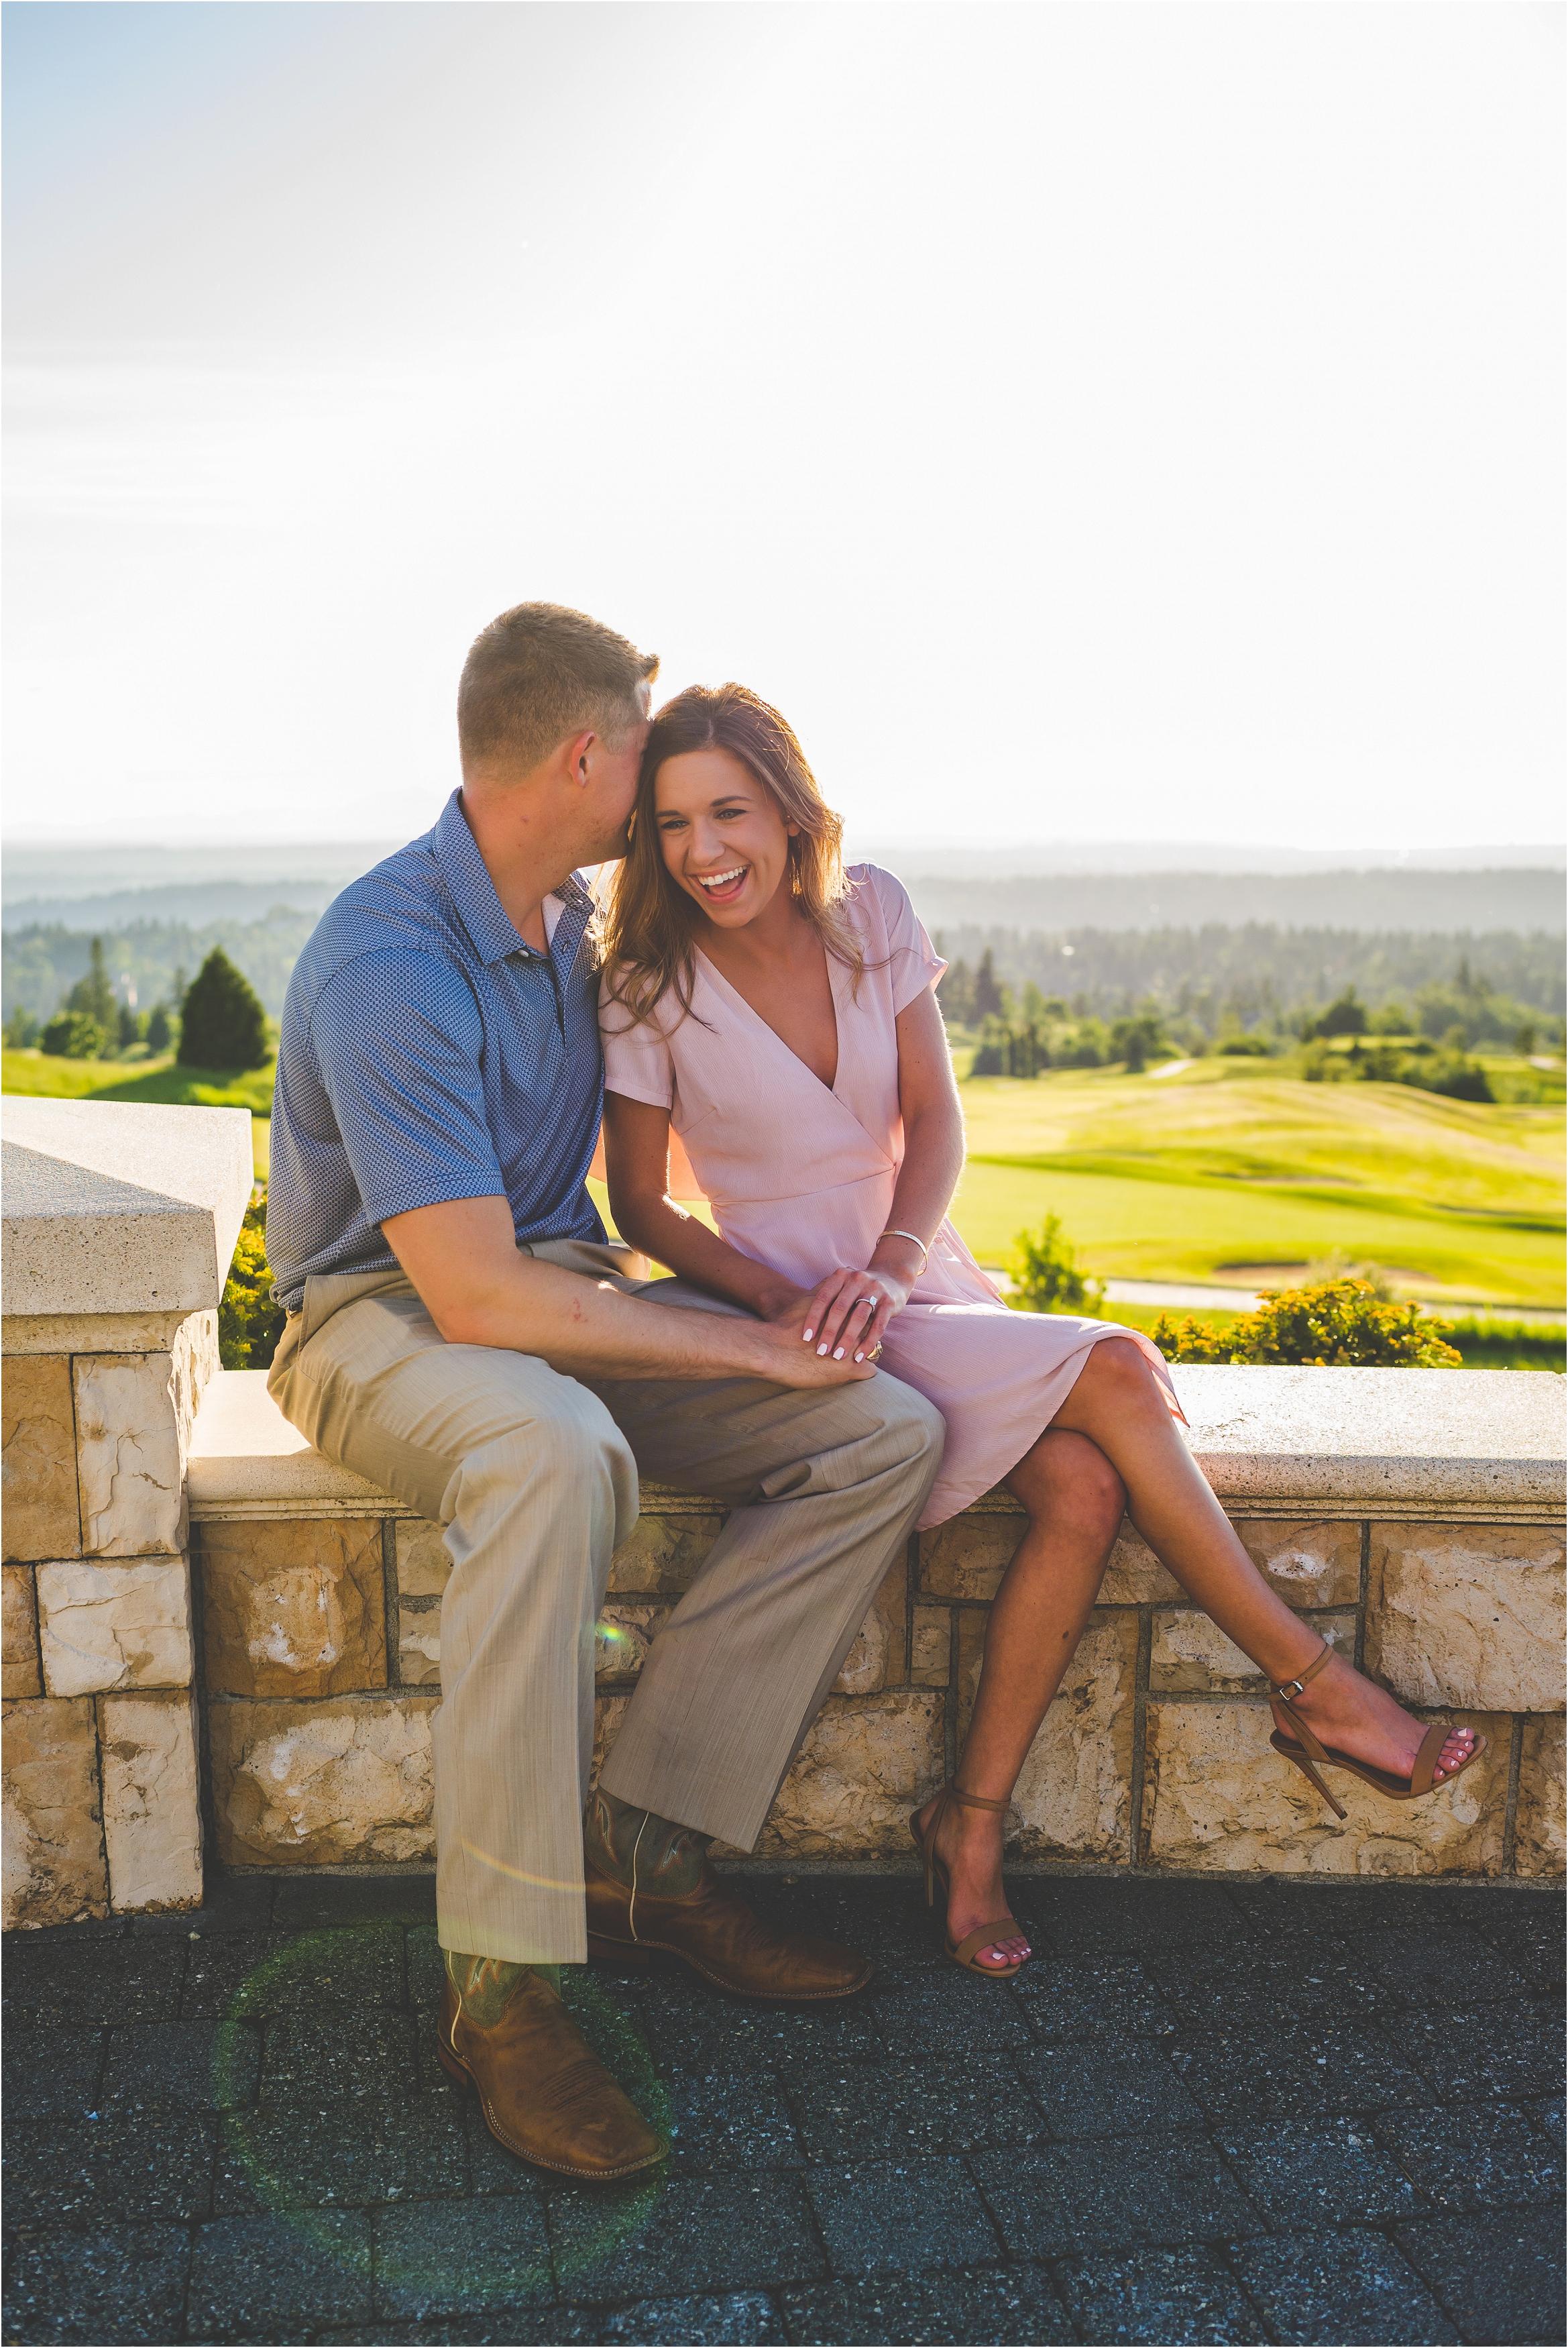 newcastle-golf-club-proposal-jannicka-mayte-seattle-washington-engagement-wedding-photographer_0025.jpg